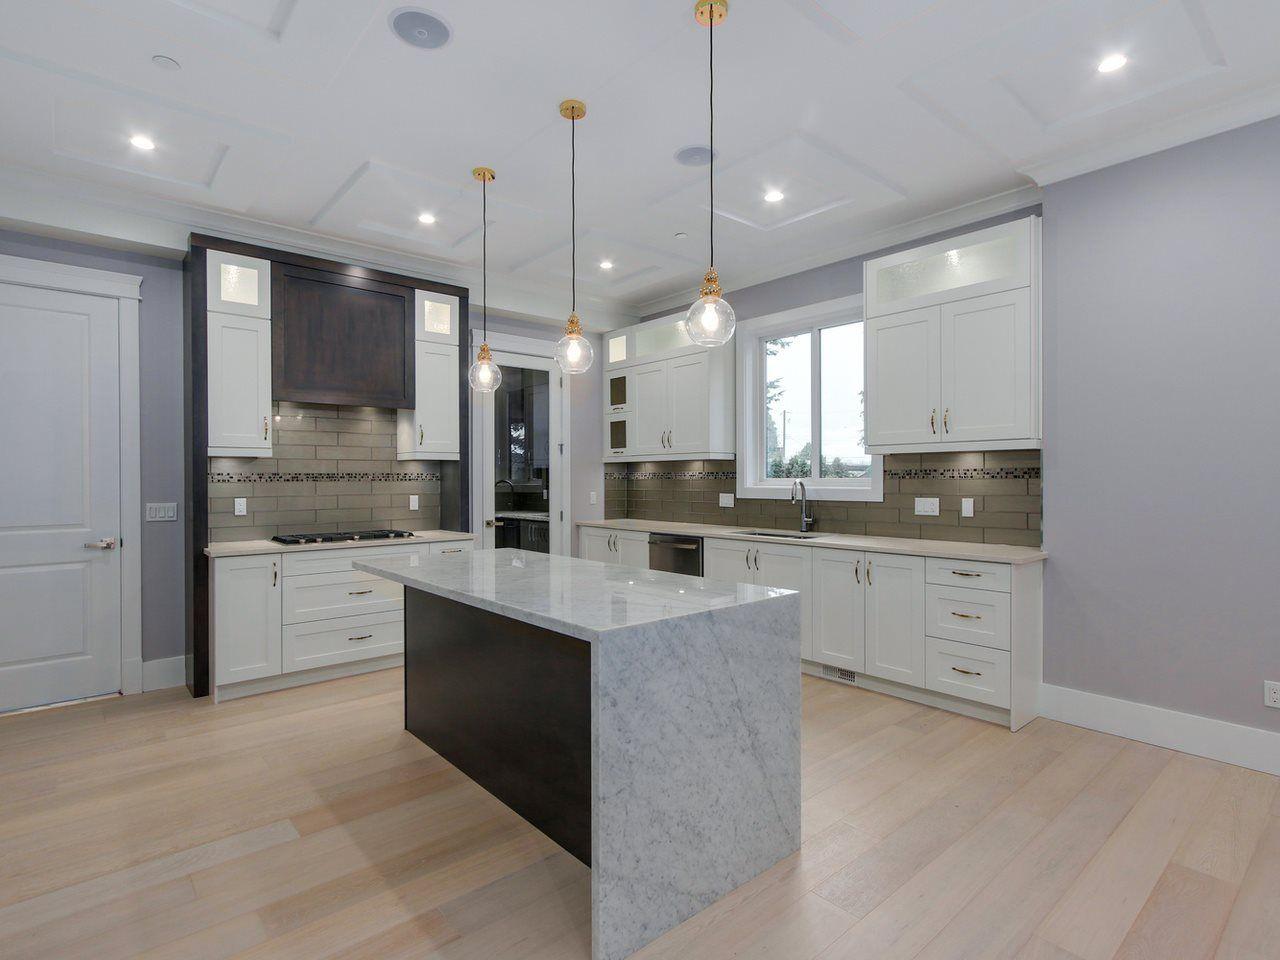 Photo 9: Photos: 1560 MAPLE Street: White Rock House for sale (South Surrey White Rock)  : MLS®# R2138926